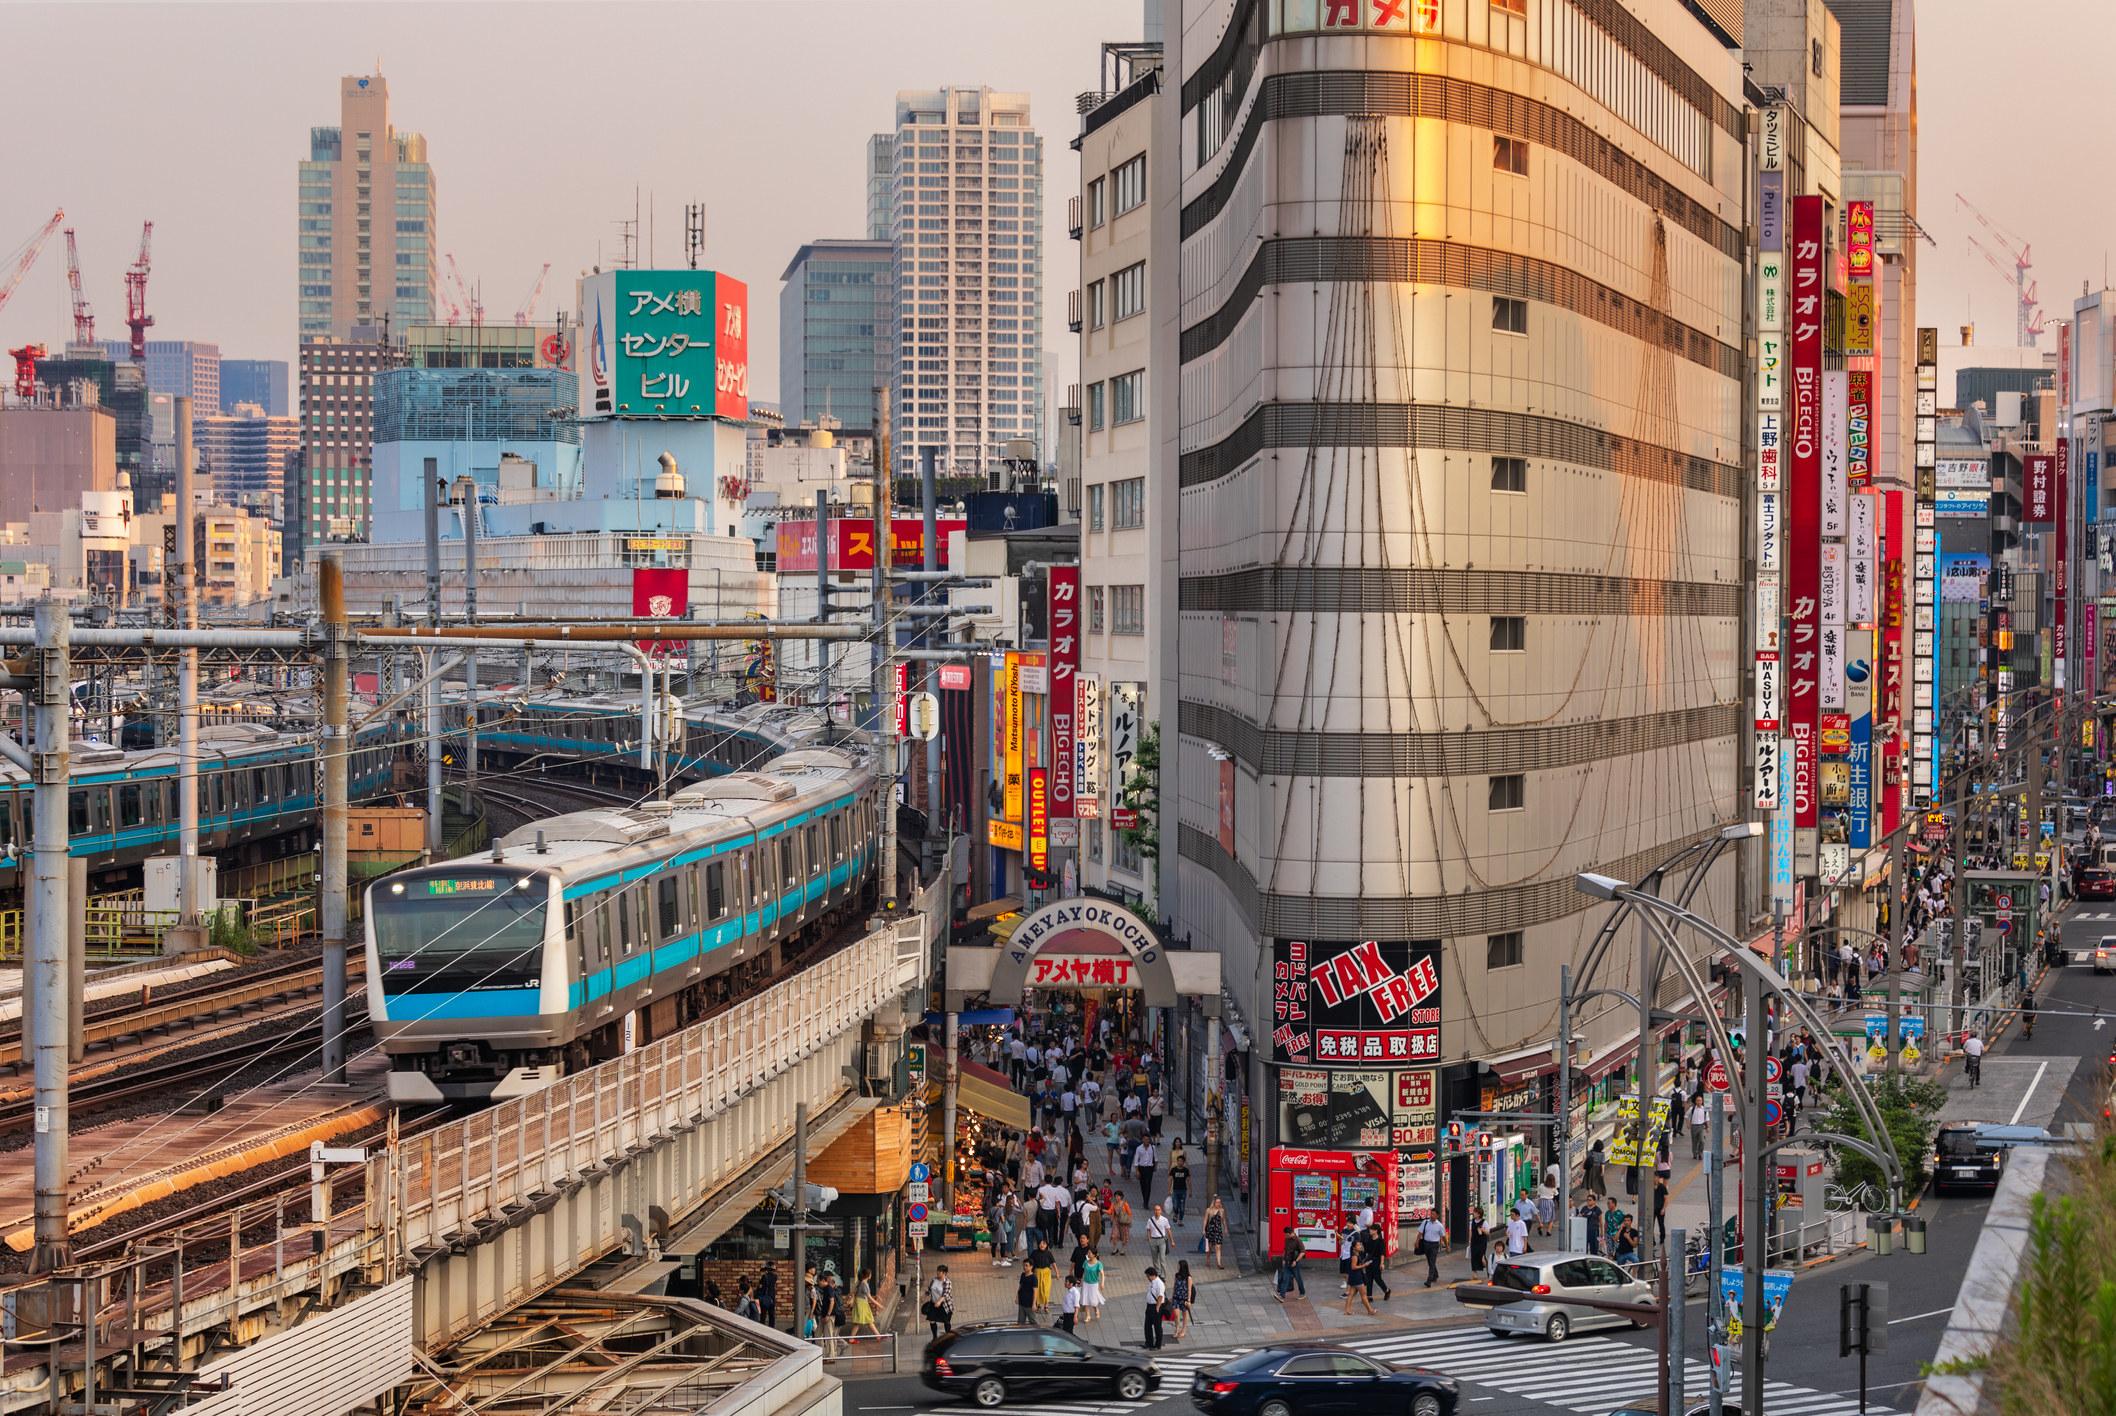 A train passing through a Japanese city.